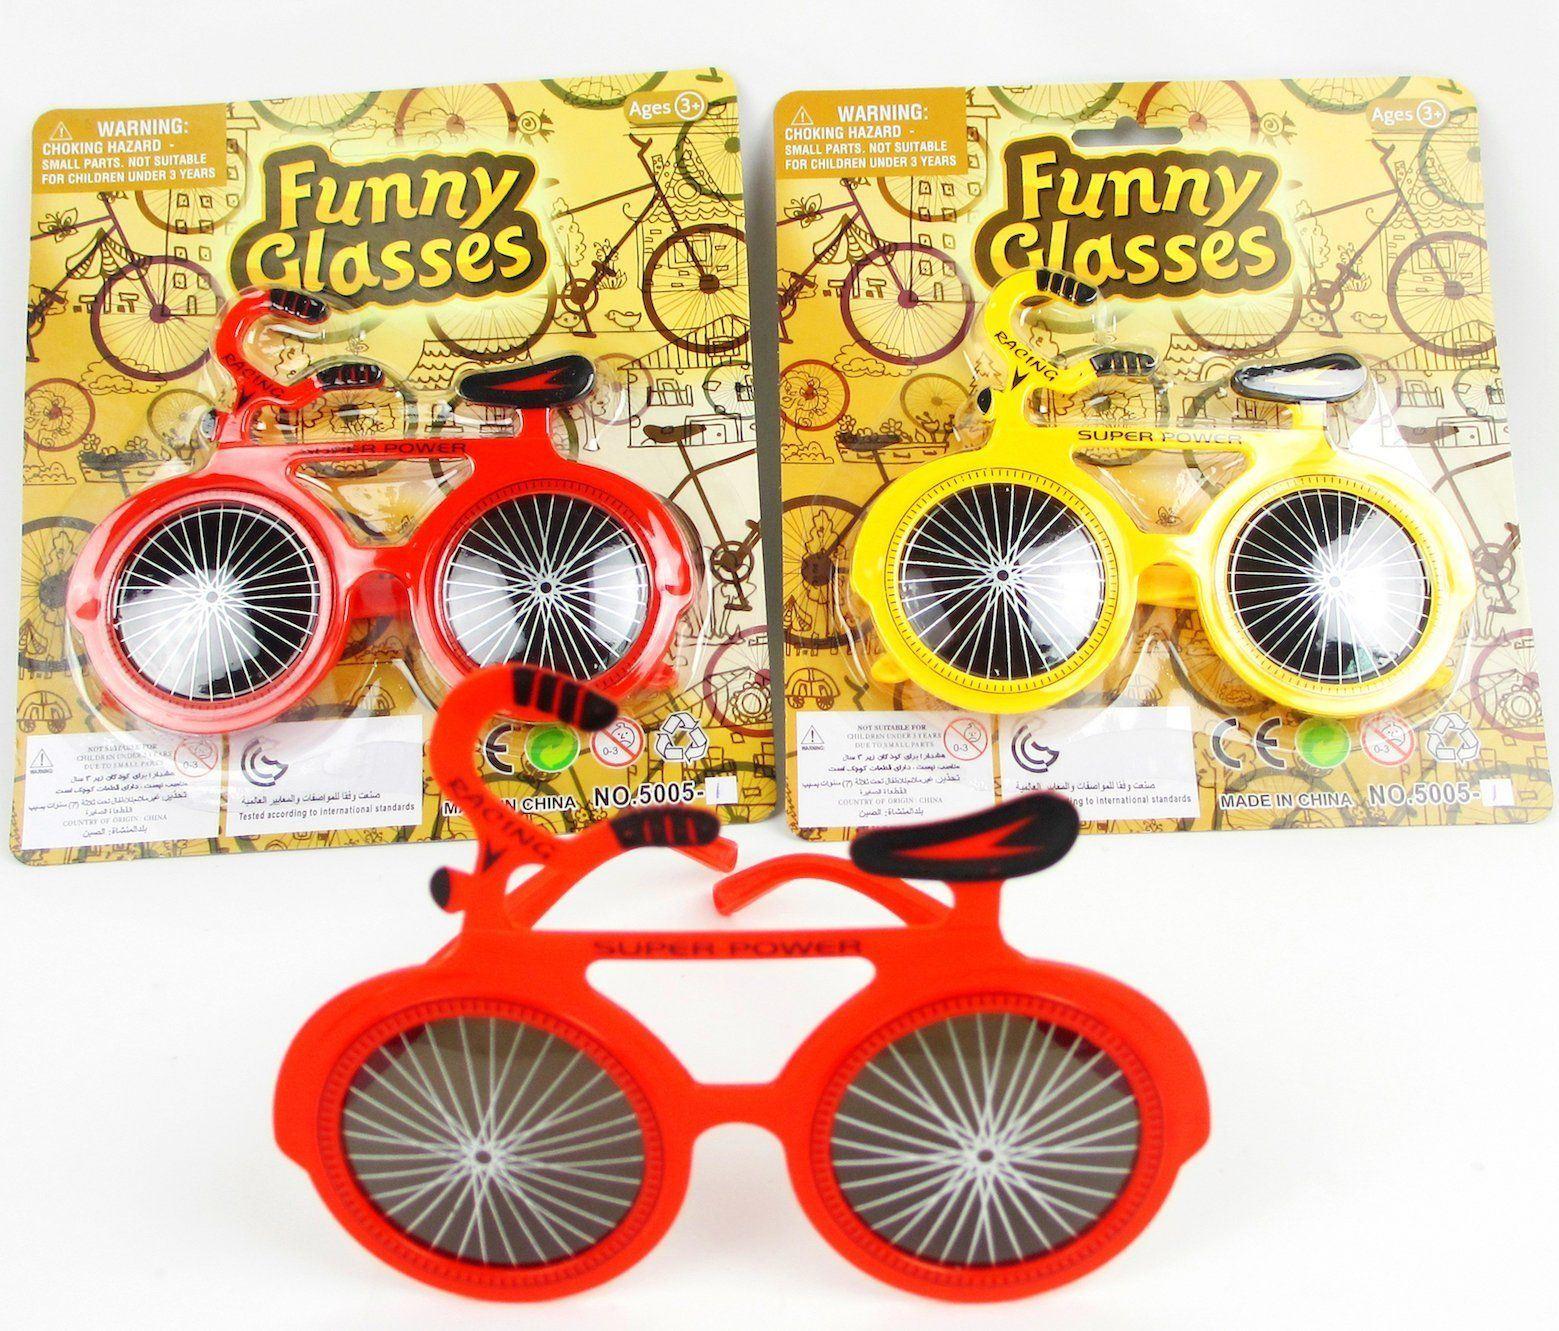 thumbnail 30 - Glasses Joke Sunglasses Fancy Dress Costume Party Fun Photo Booth Prop 1-12Pcs